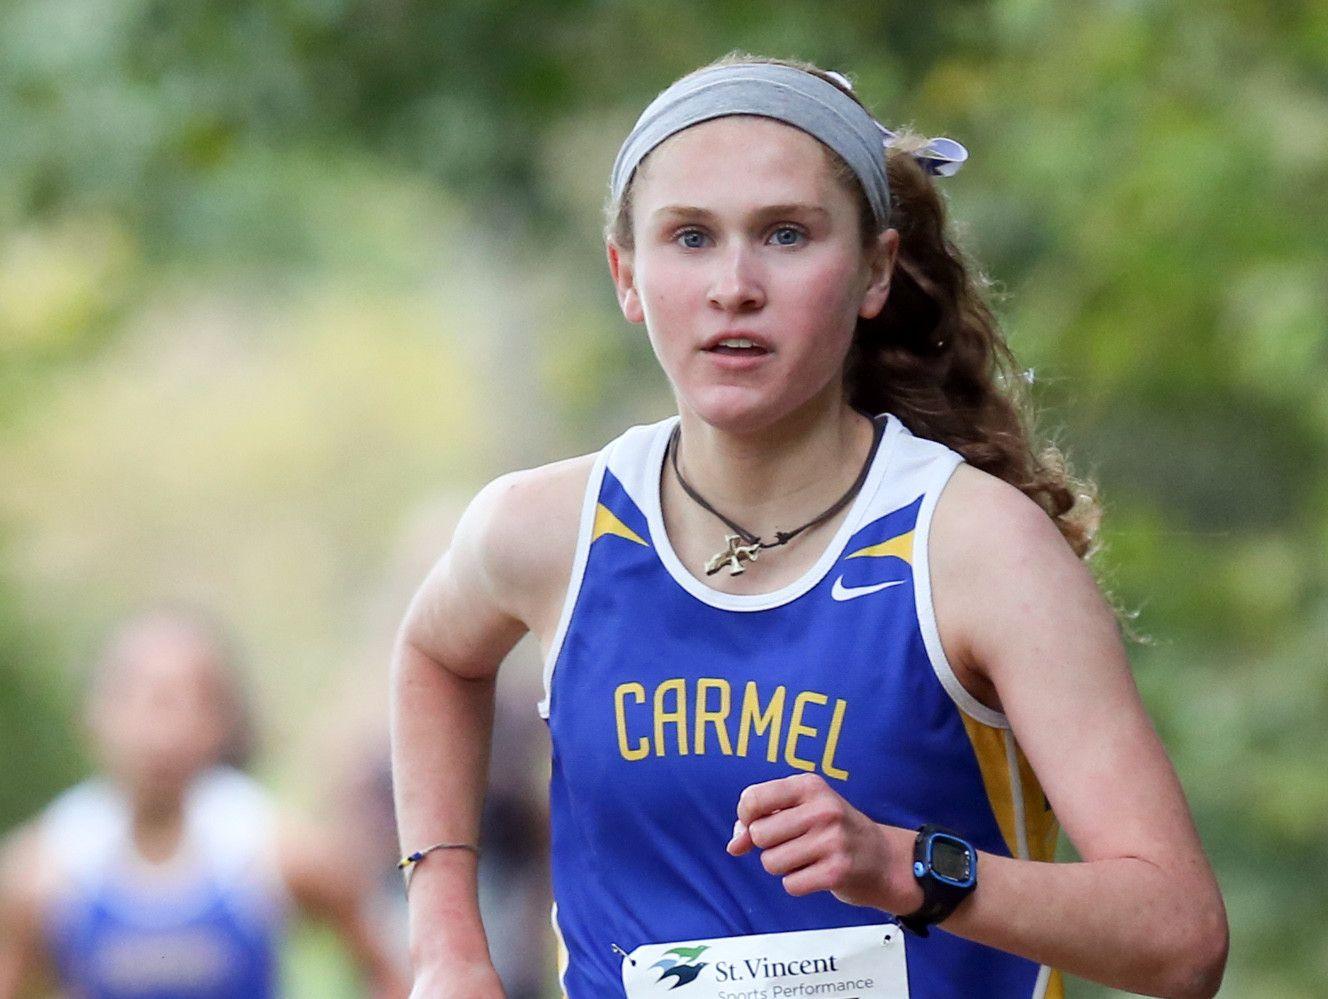 Carmel's Sarah Leinheiser, the defending state champ, won the girls race at Saturday's Noblesville regional.